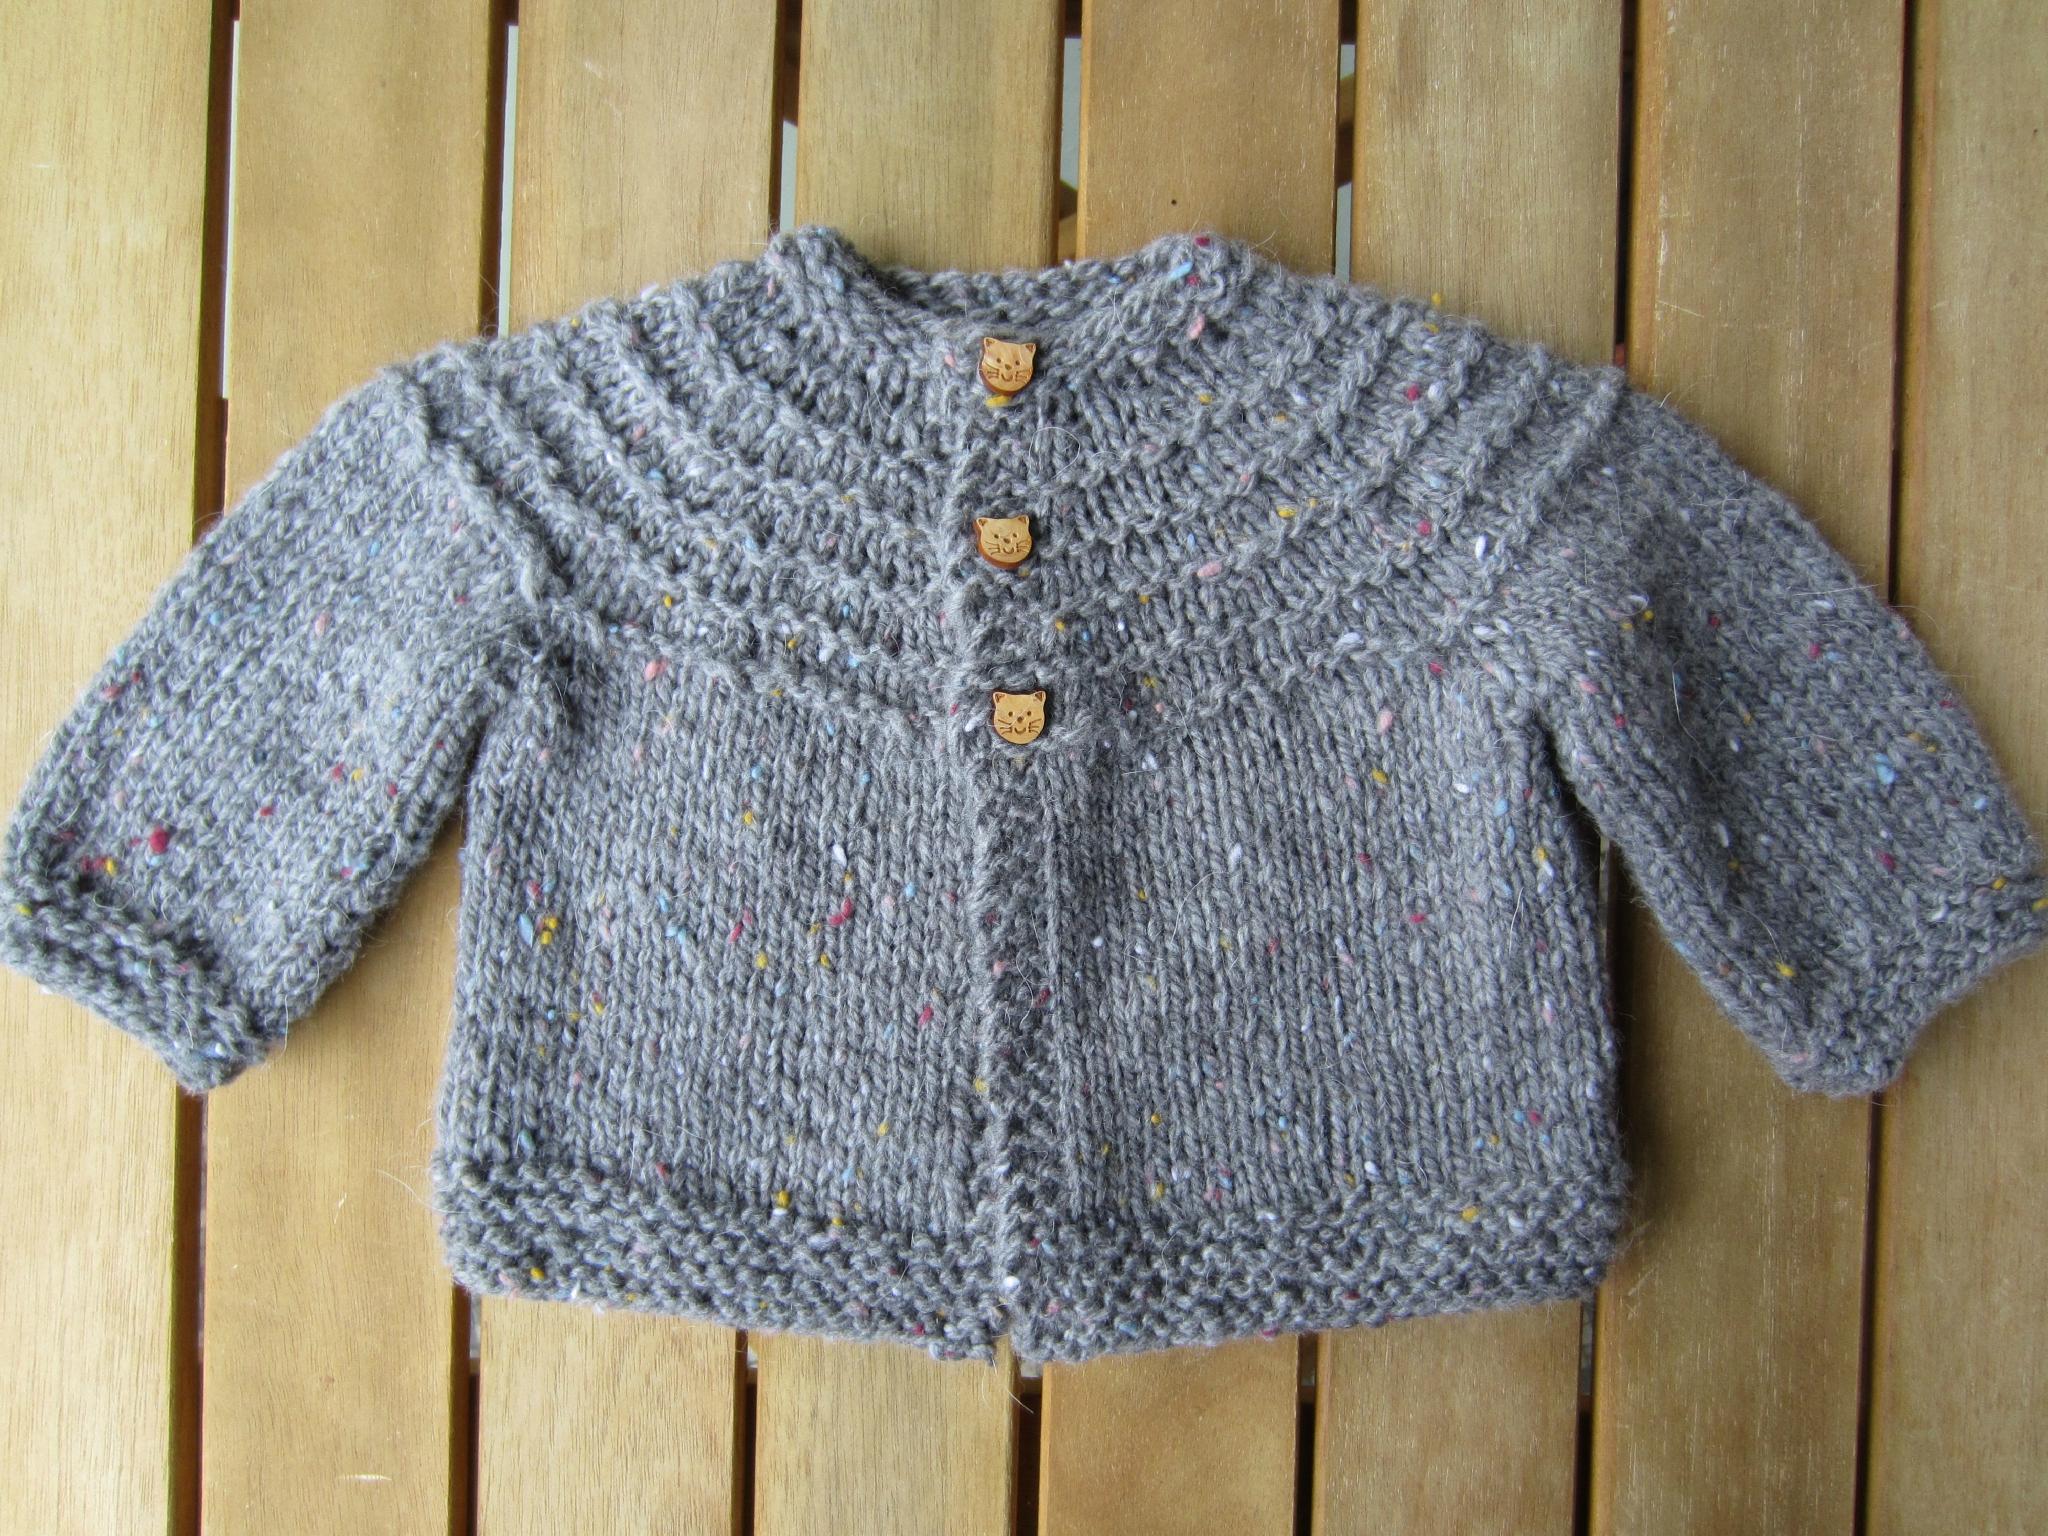 modèle tricot layette 3 mois